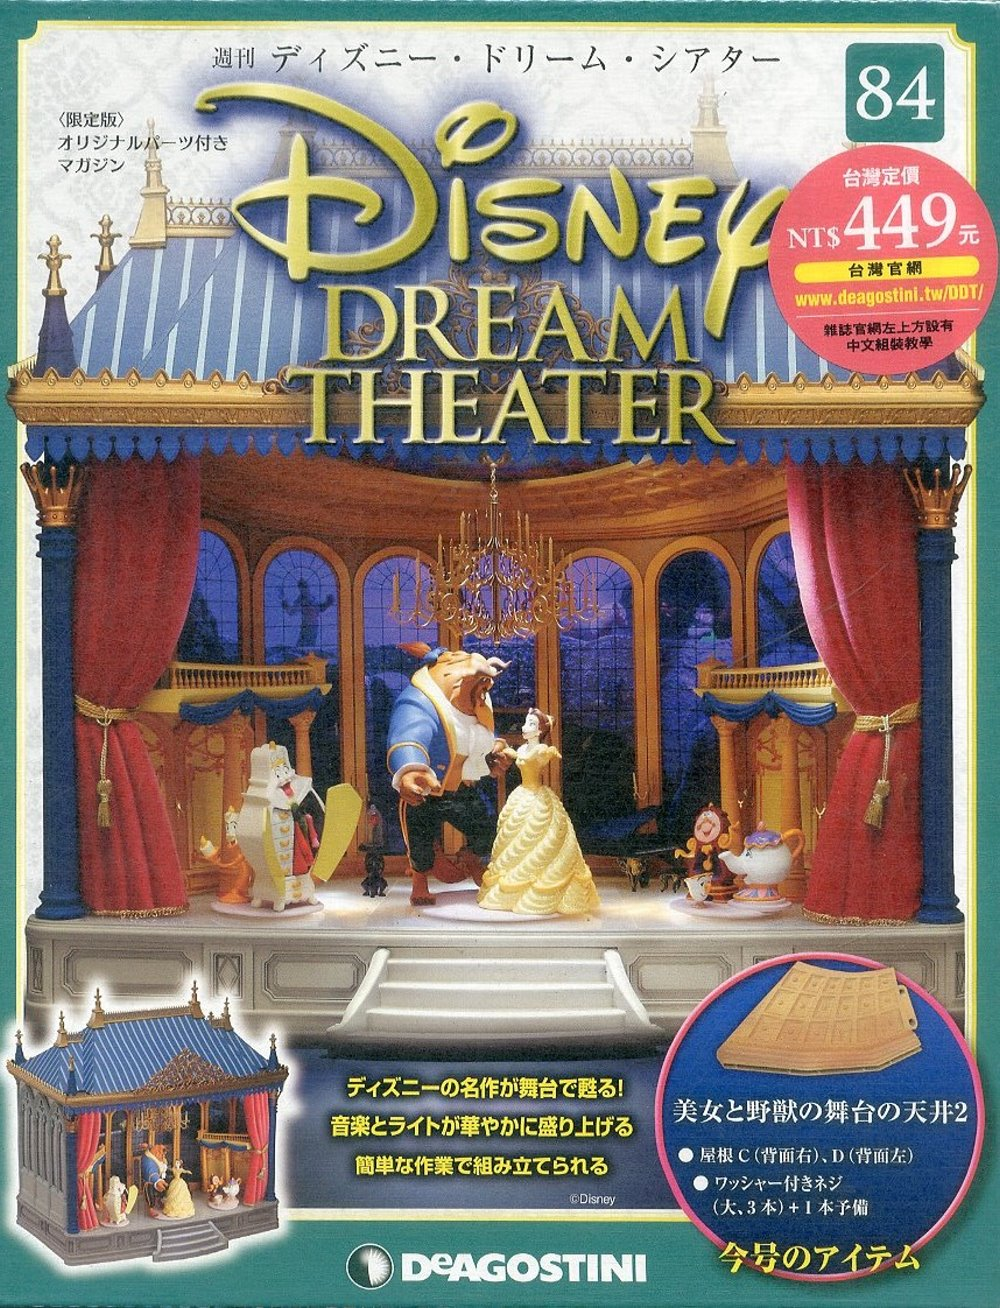 Disney Dream Theater 迪士尼夢幻劇場 (日文版) 2018/6/5第84期